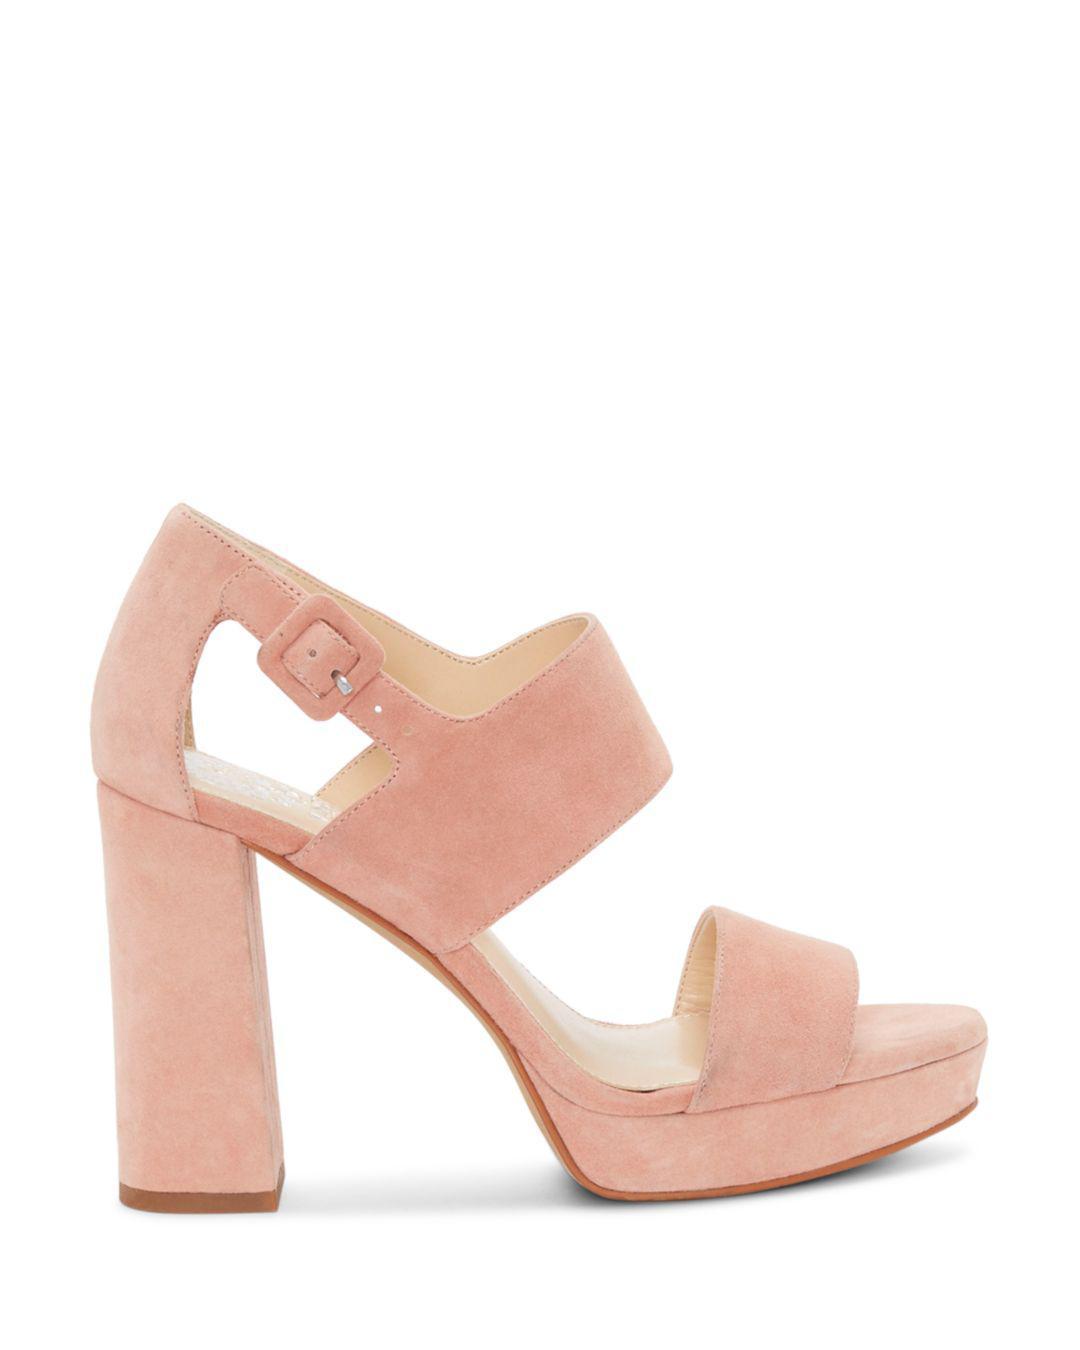 7d928e79d2e Lyst - Vince Camuto Women s Jayvid Suede Platform Sandals in Pink - Save 51%